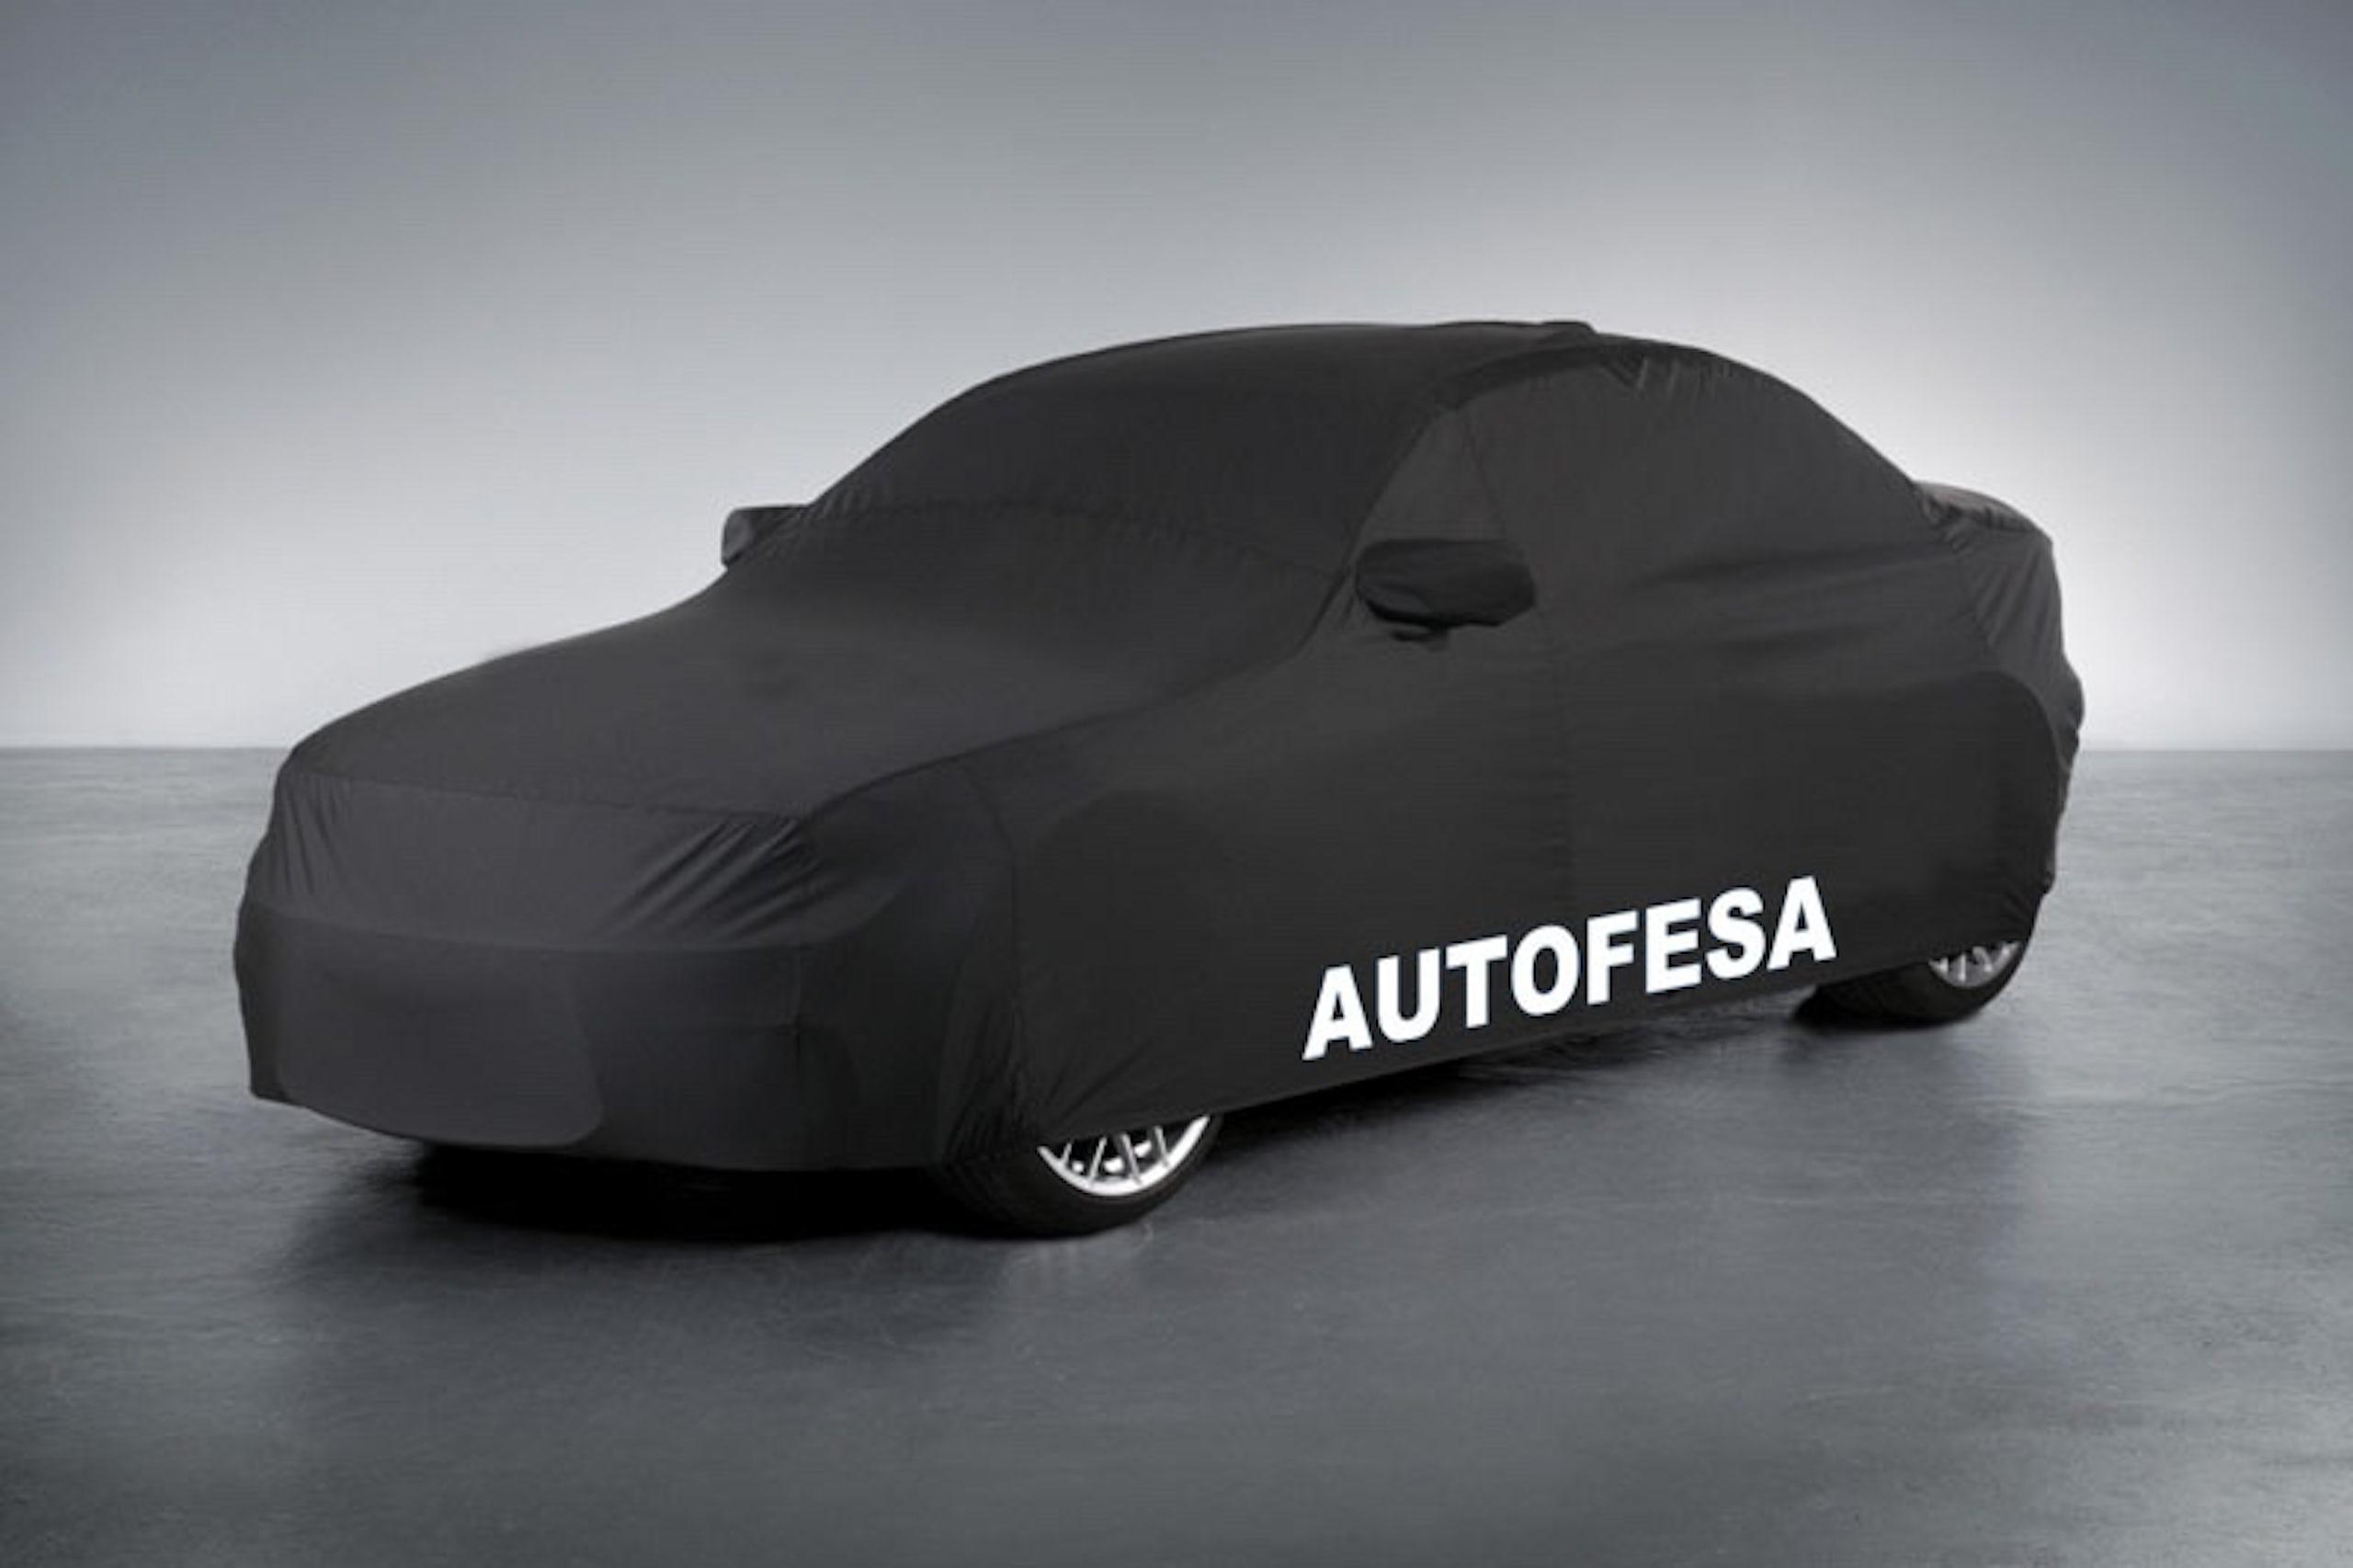 Audi Q5 2.0 TDI 170cv quattro 5p S tronic Auto - Foto 30